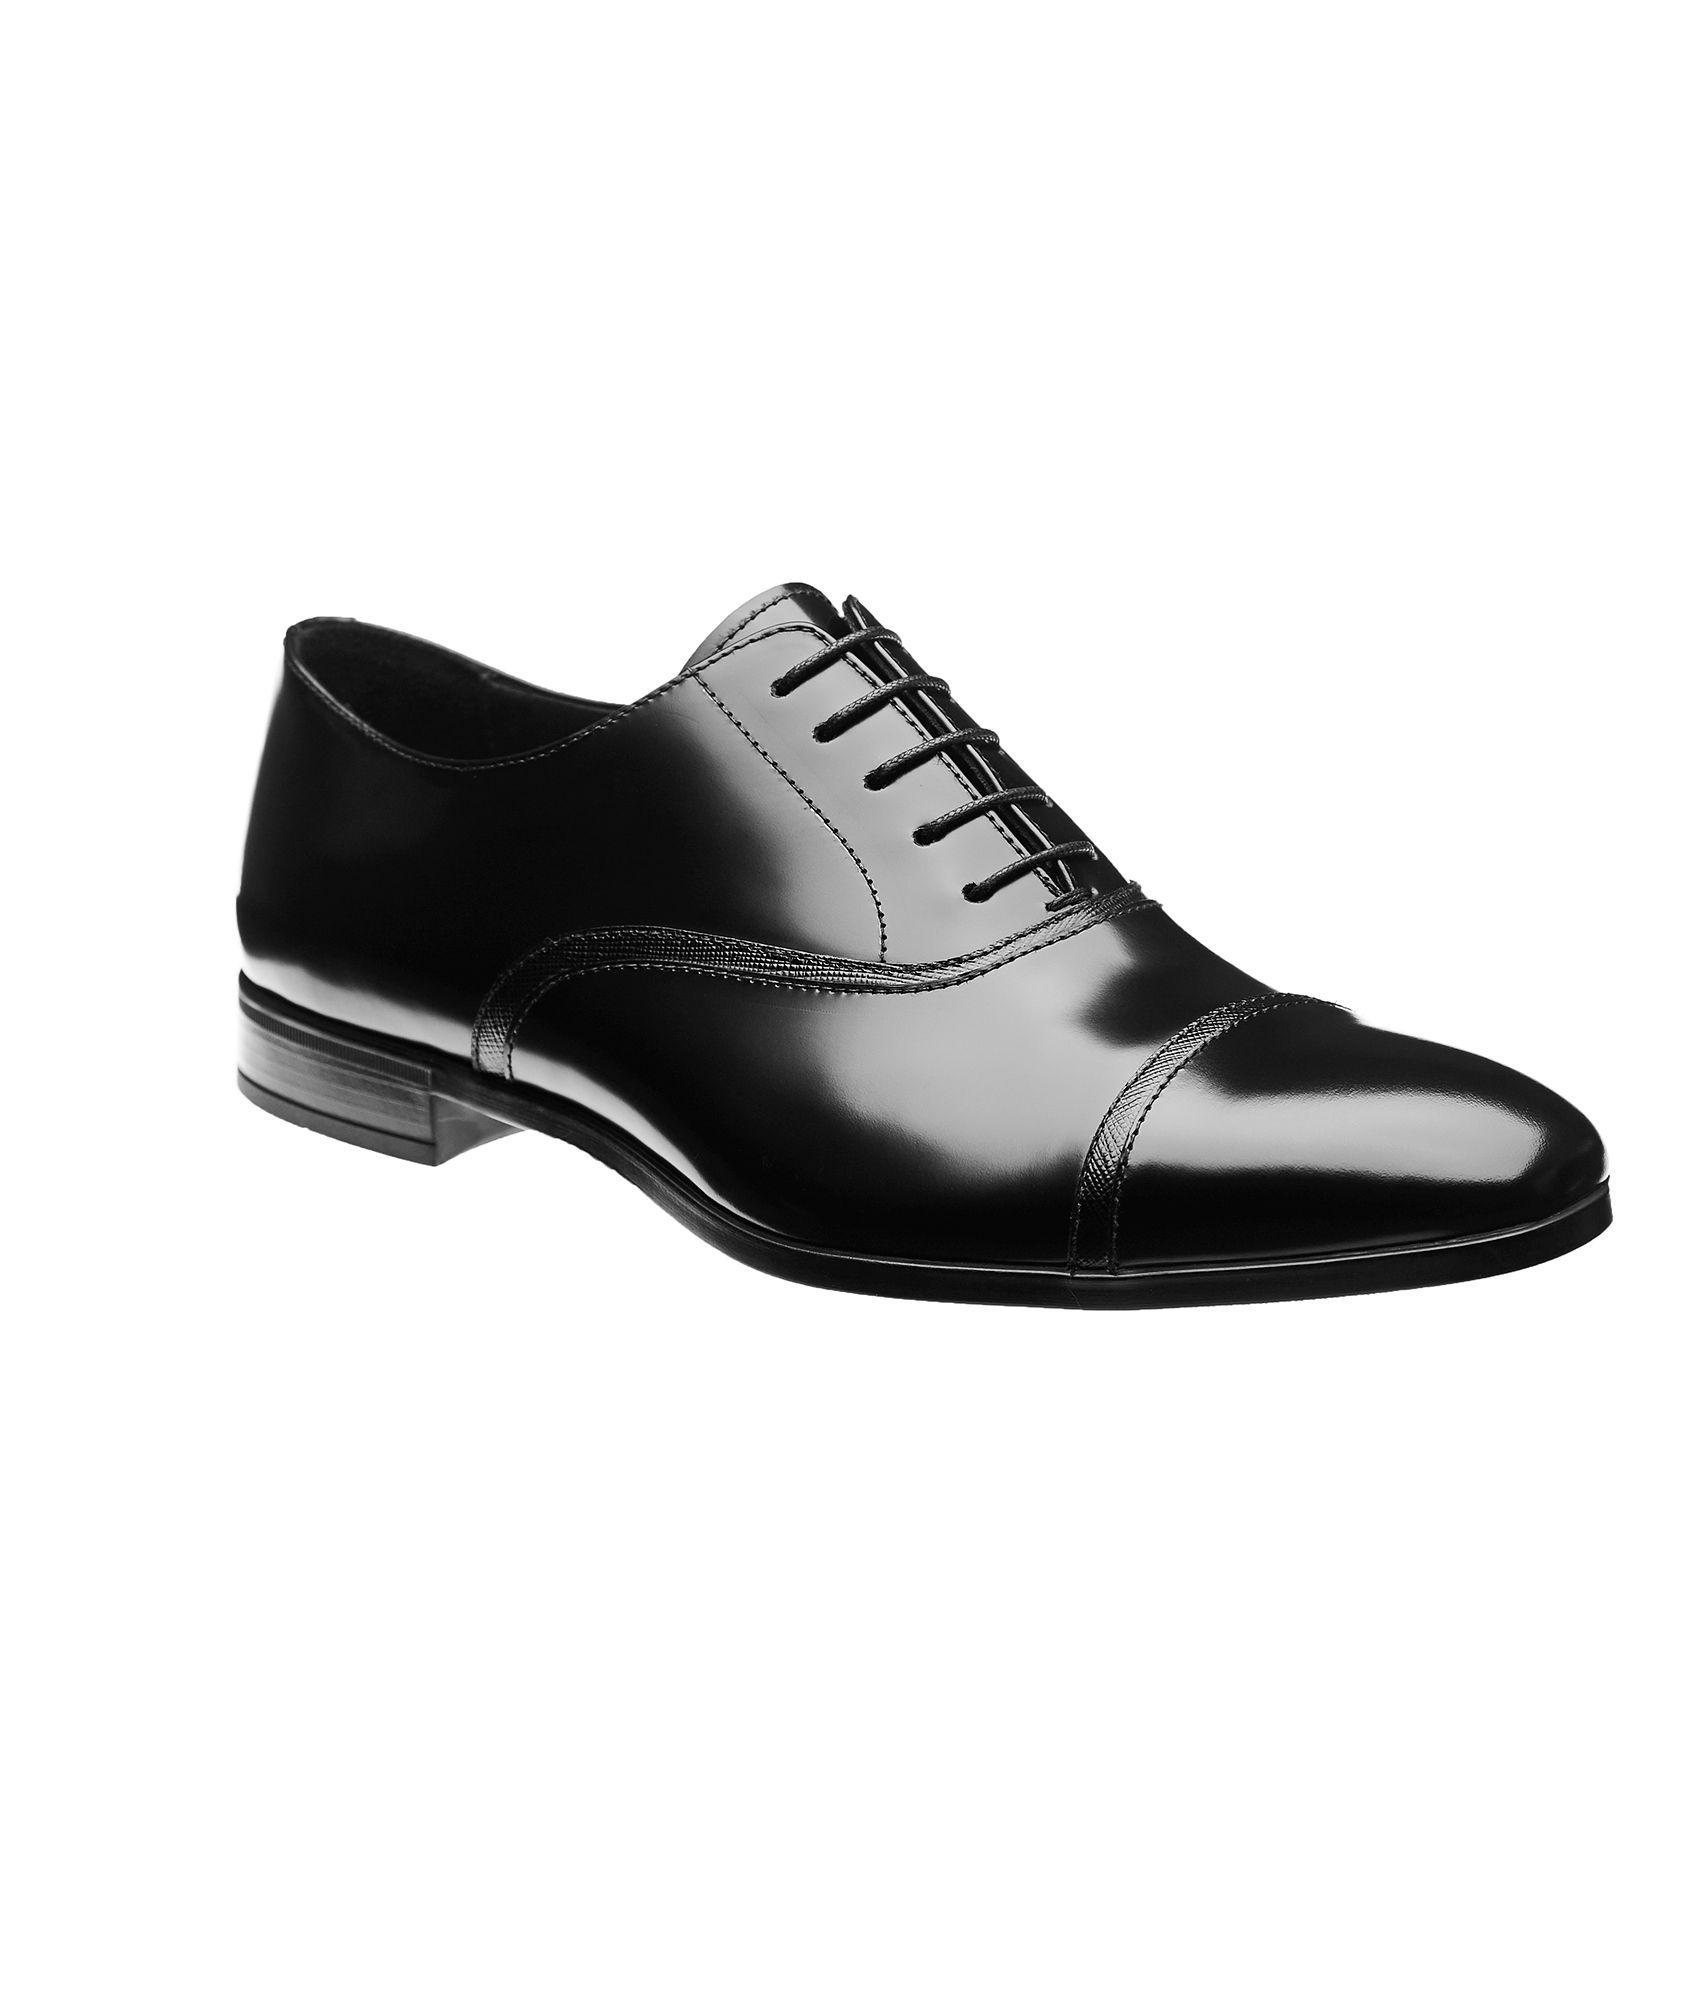 Prada Leather Oxfords   Dress Shoes